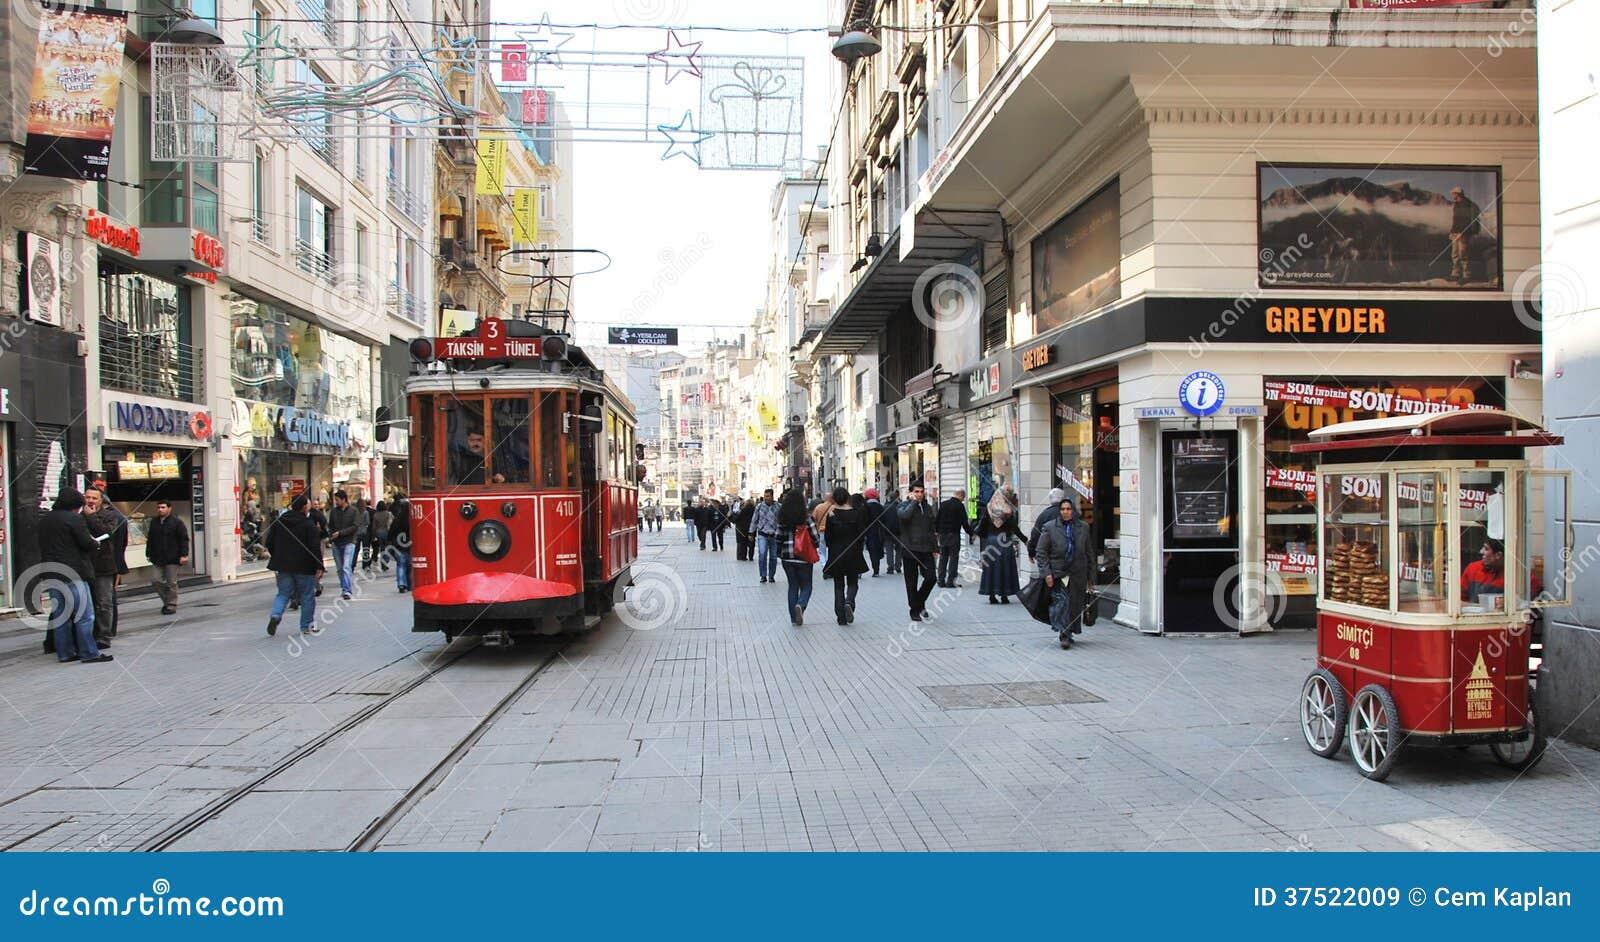 Beyoglu -Taksim tram